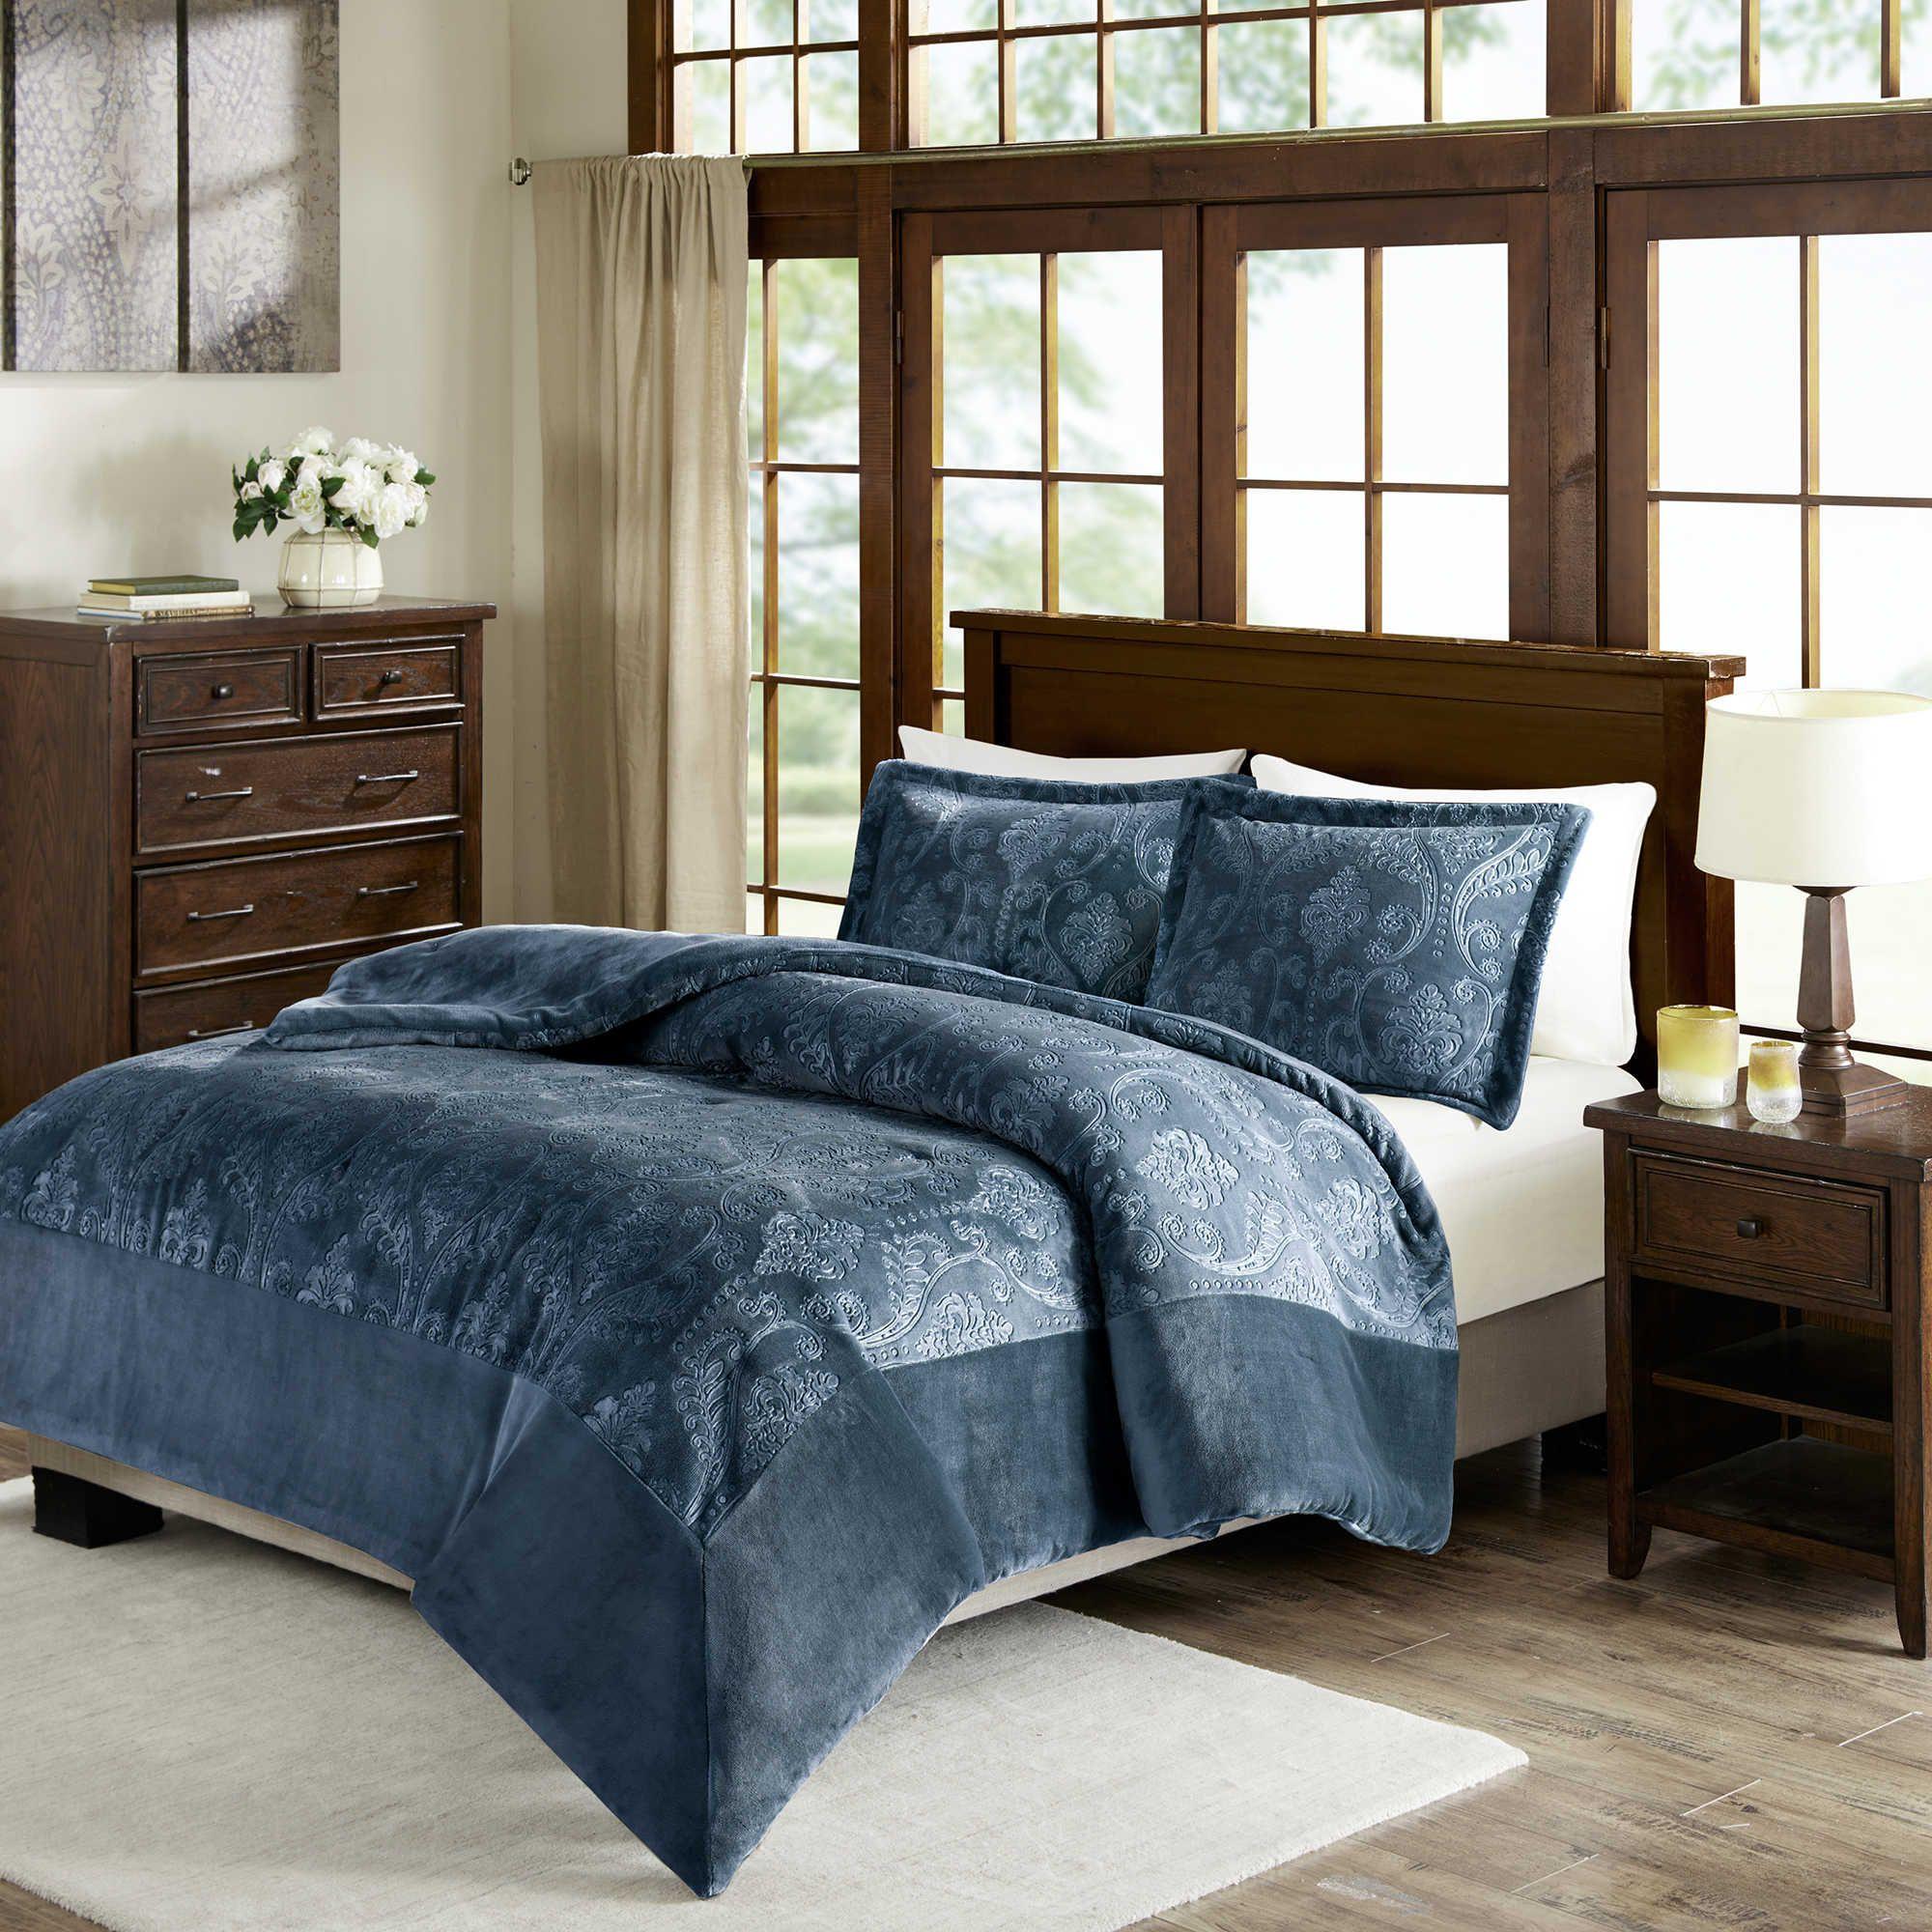 Premier Comfort Kramer King California King Comforter Set In Blue